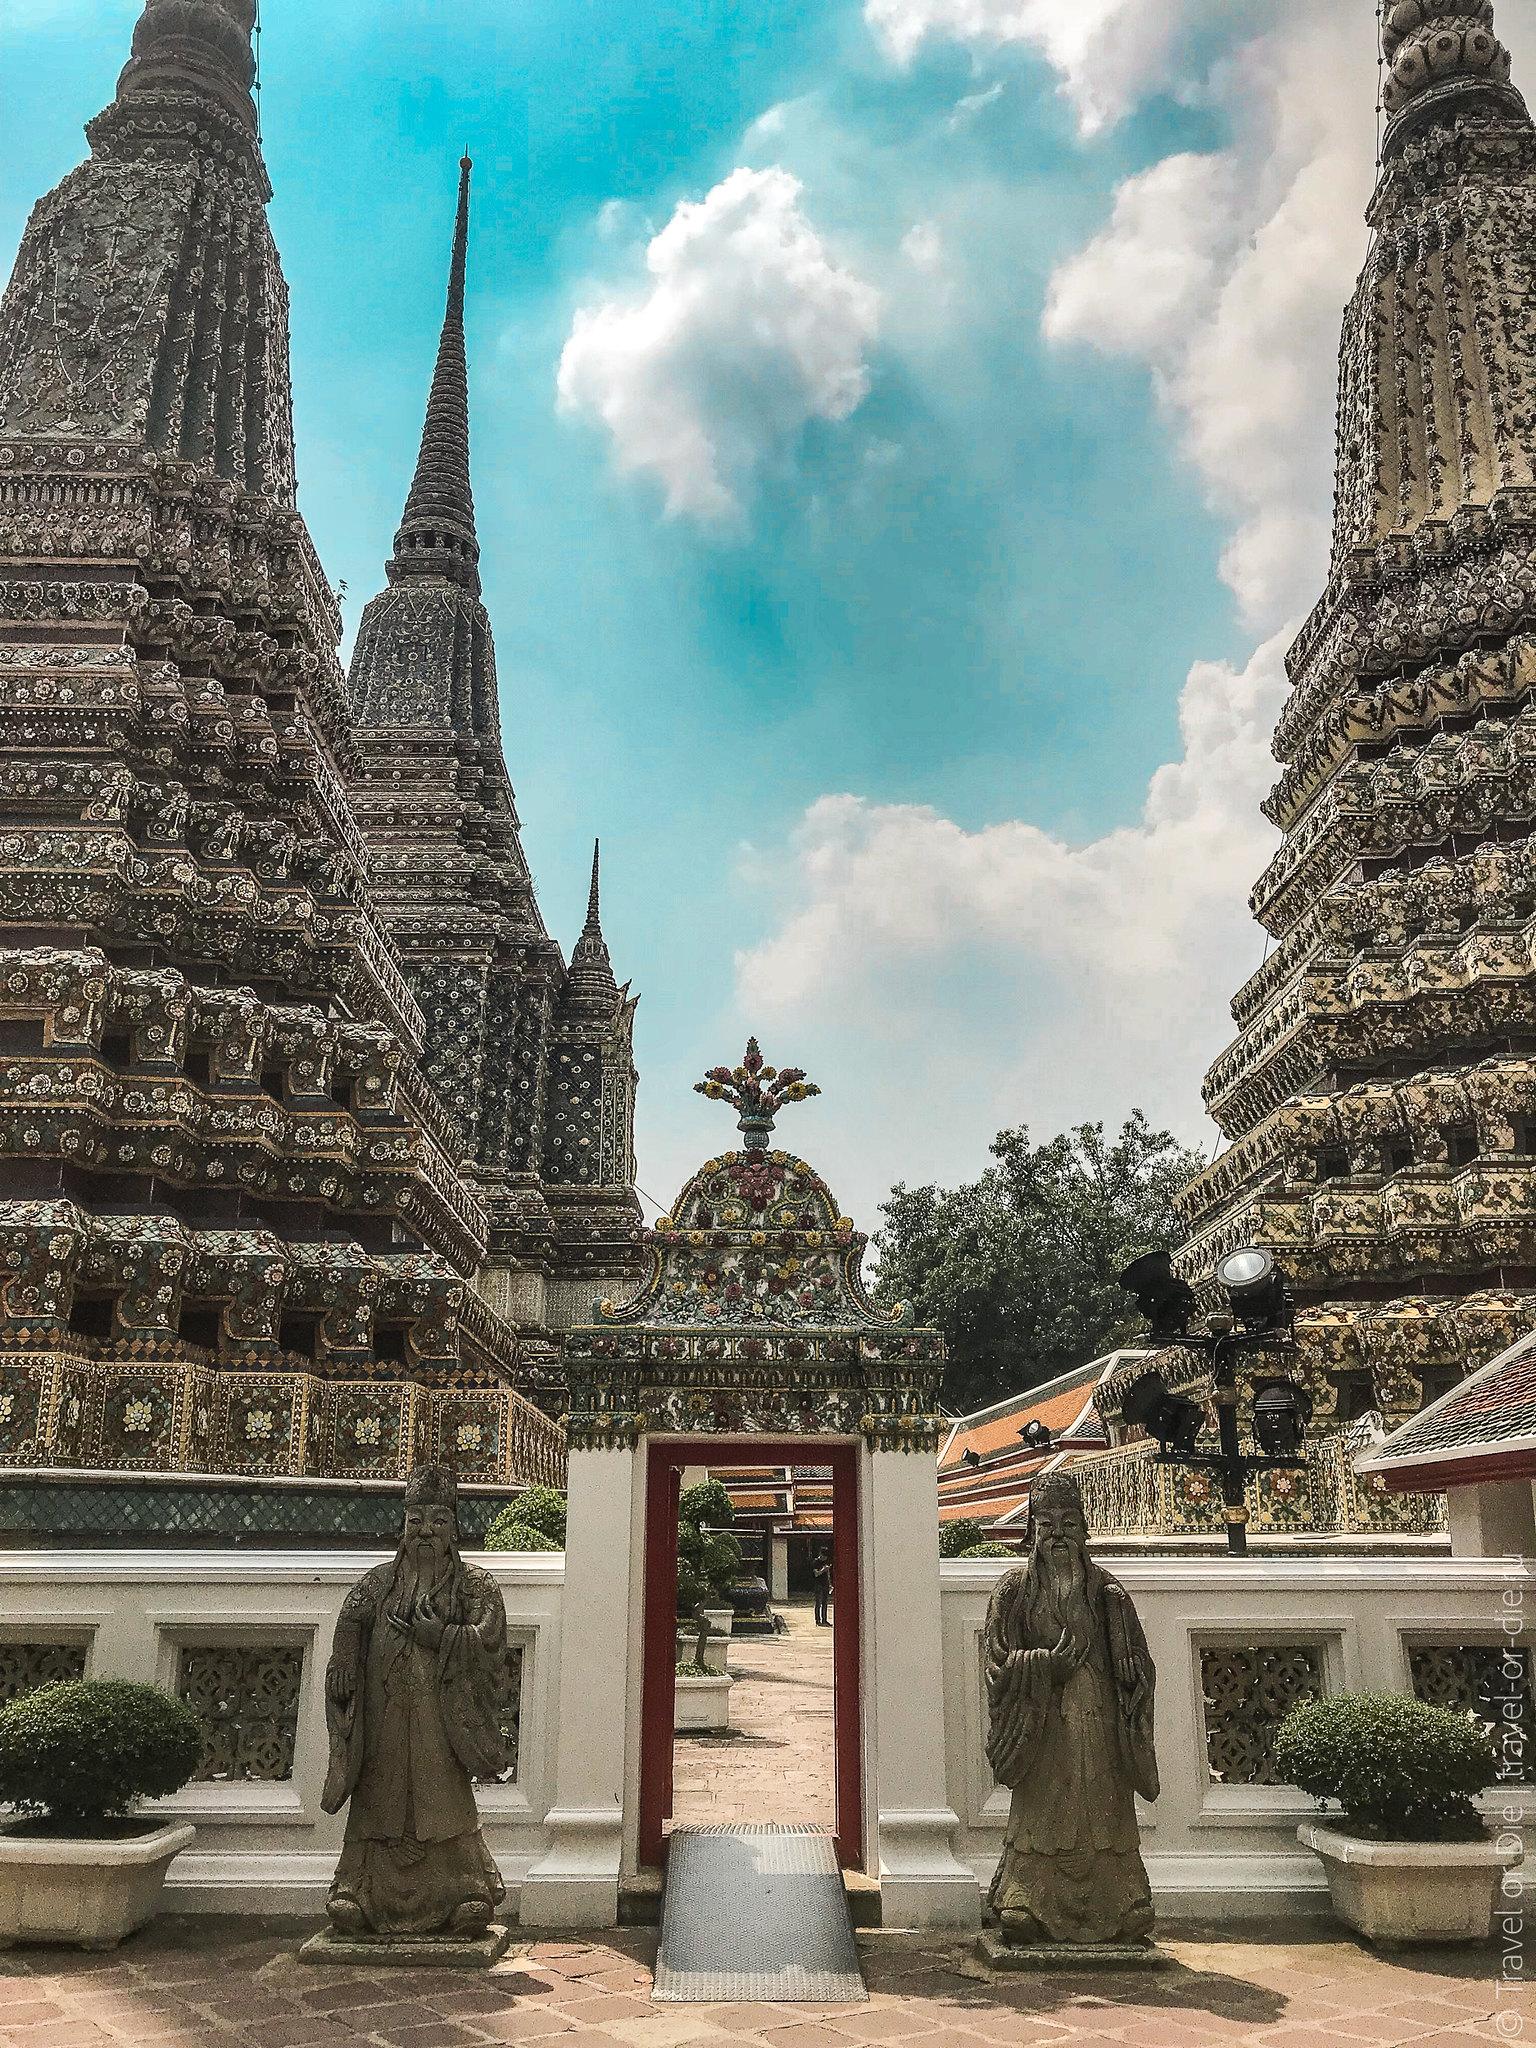 Wat-Pho-Bangkok-Храм-Лежащего-Будды-9120